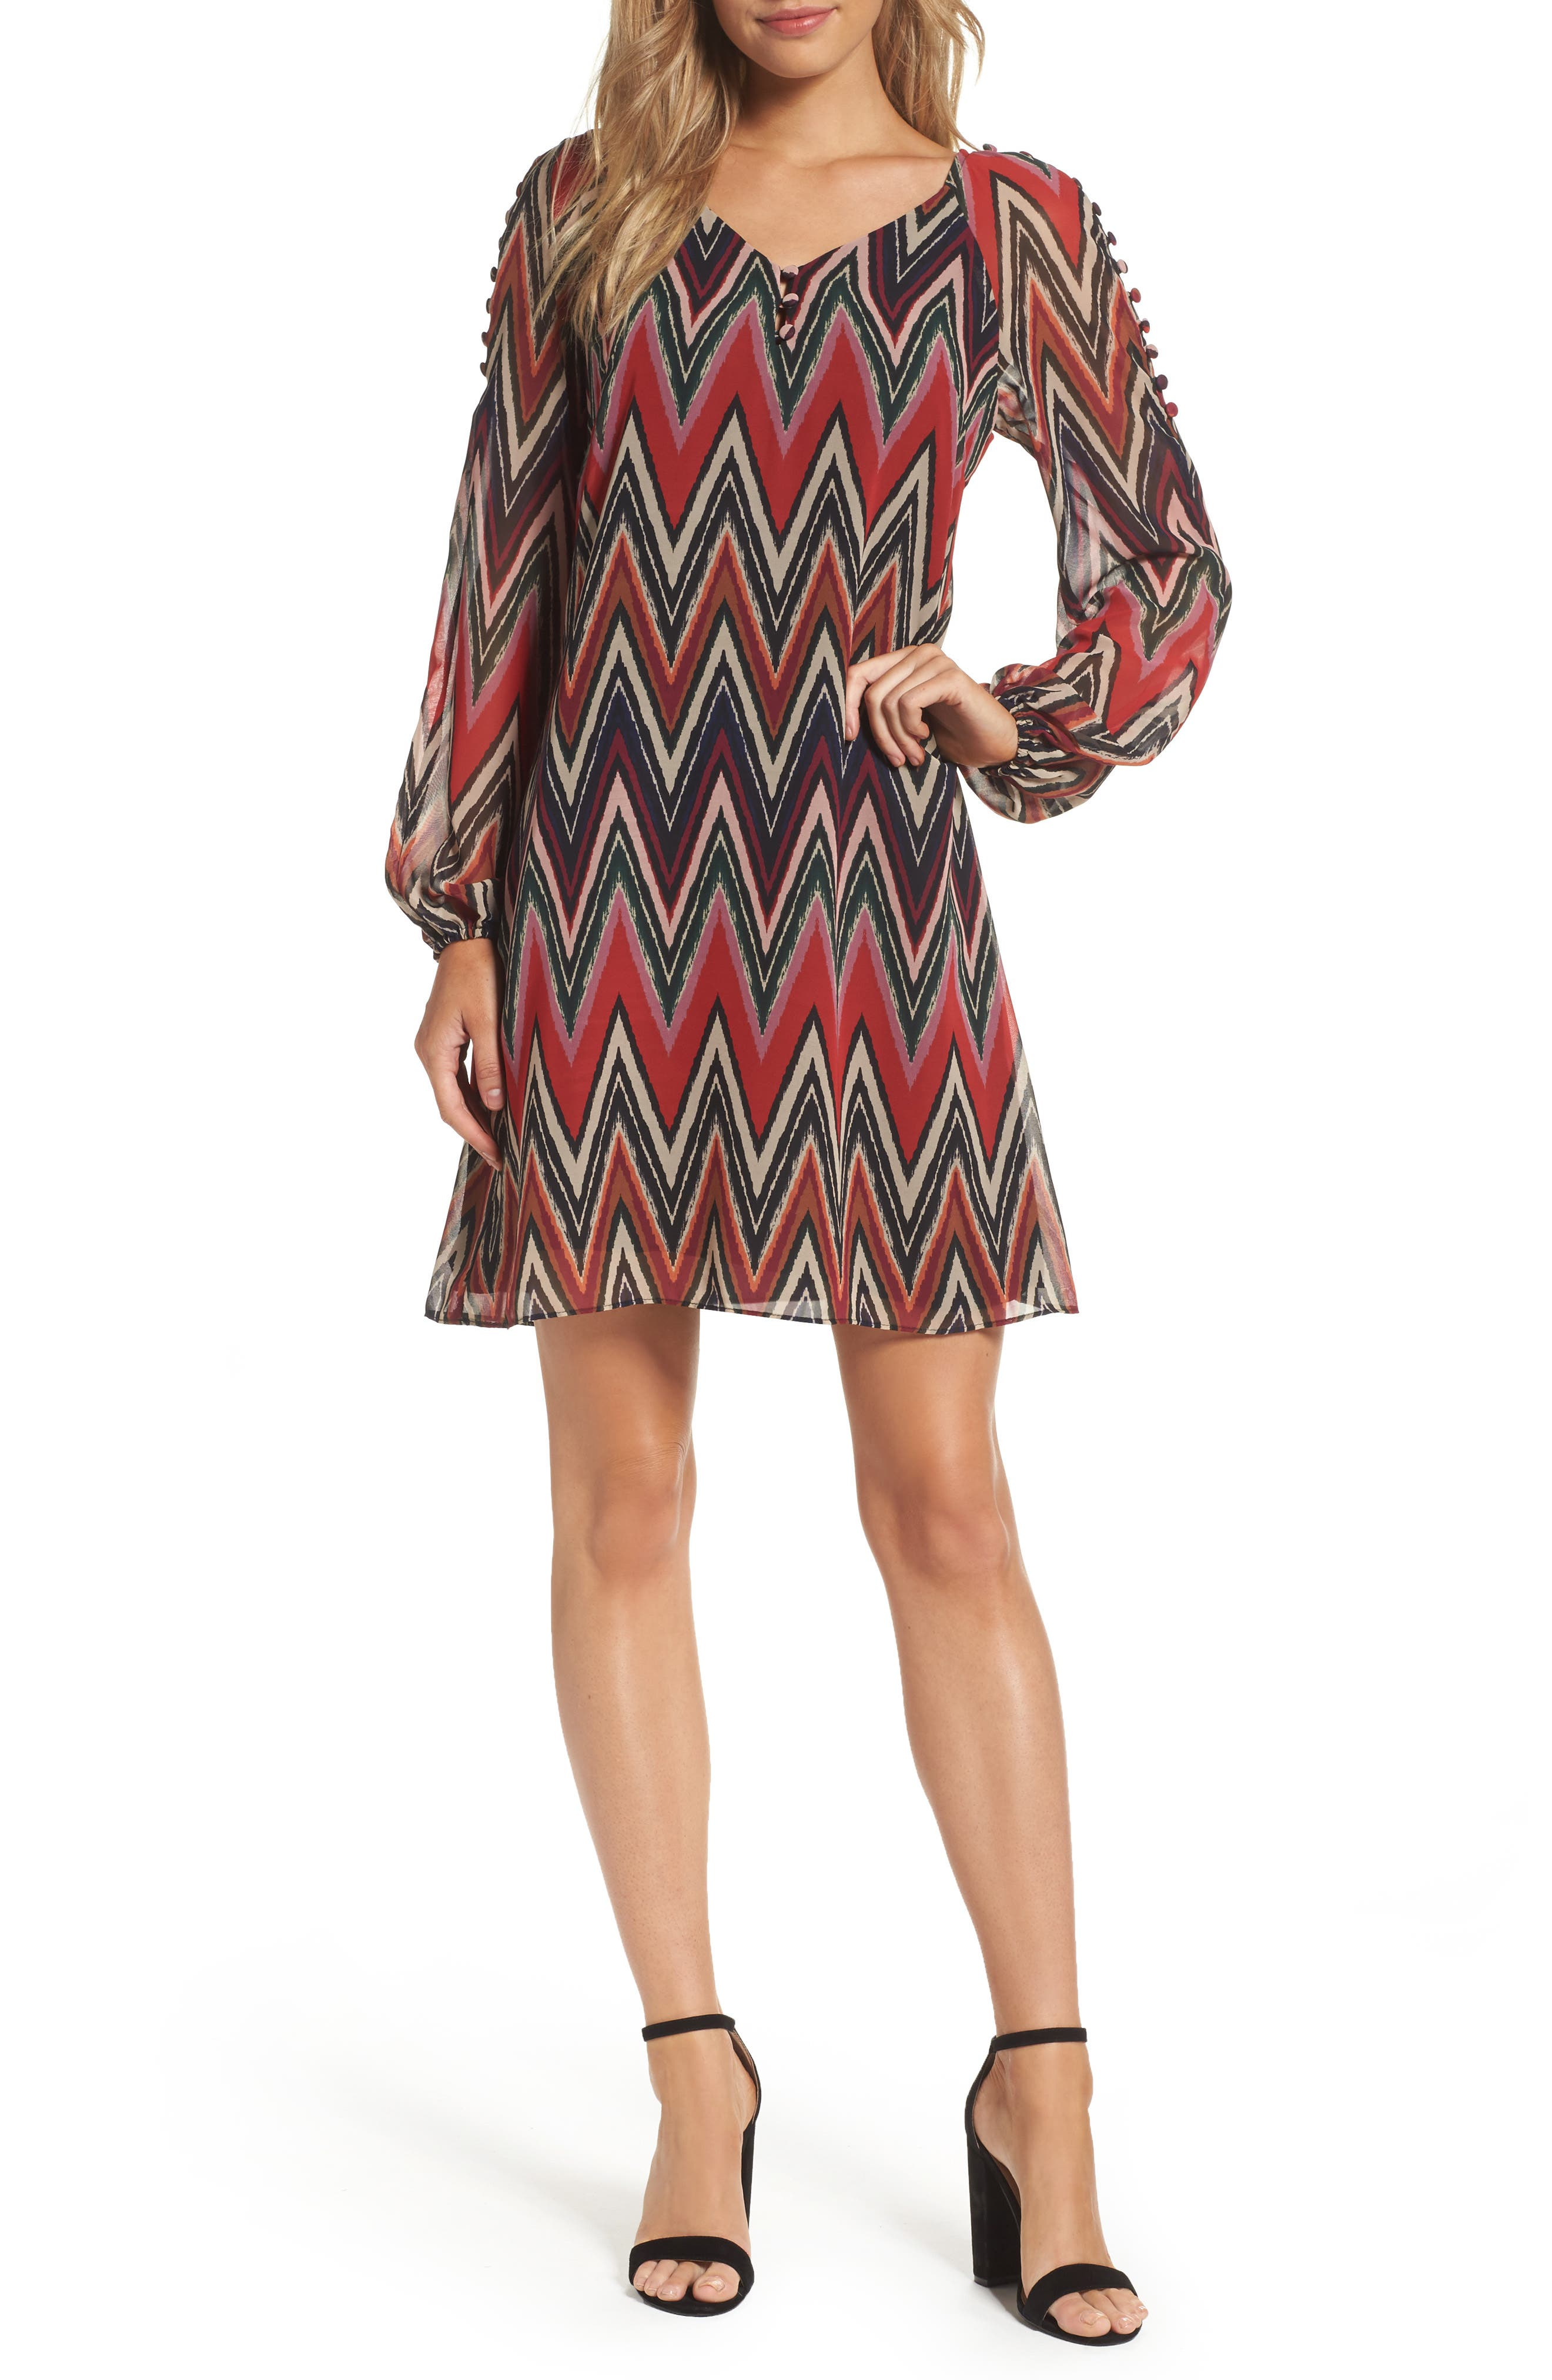 Taylor Dresses Chevron Swing Dress